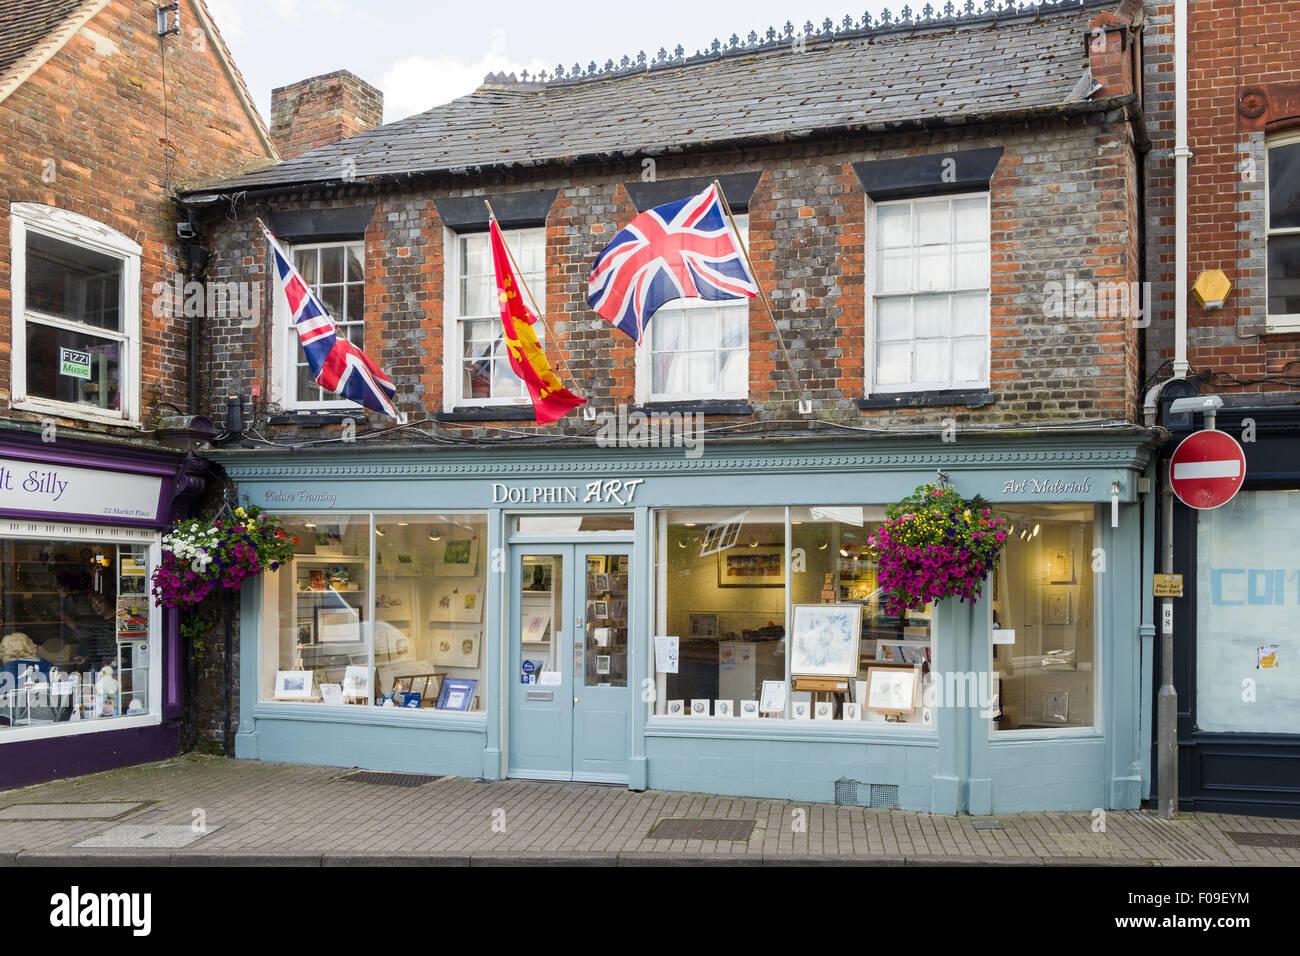 Le Dolphin Gallery, Market Place, Wantage, Oxfordshire, UK. Banque D'Images